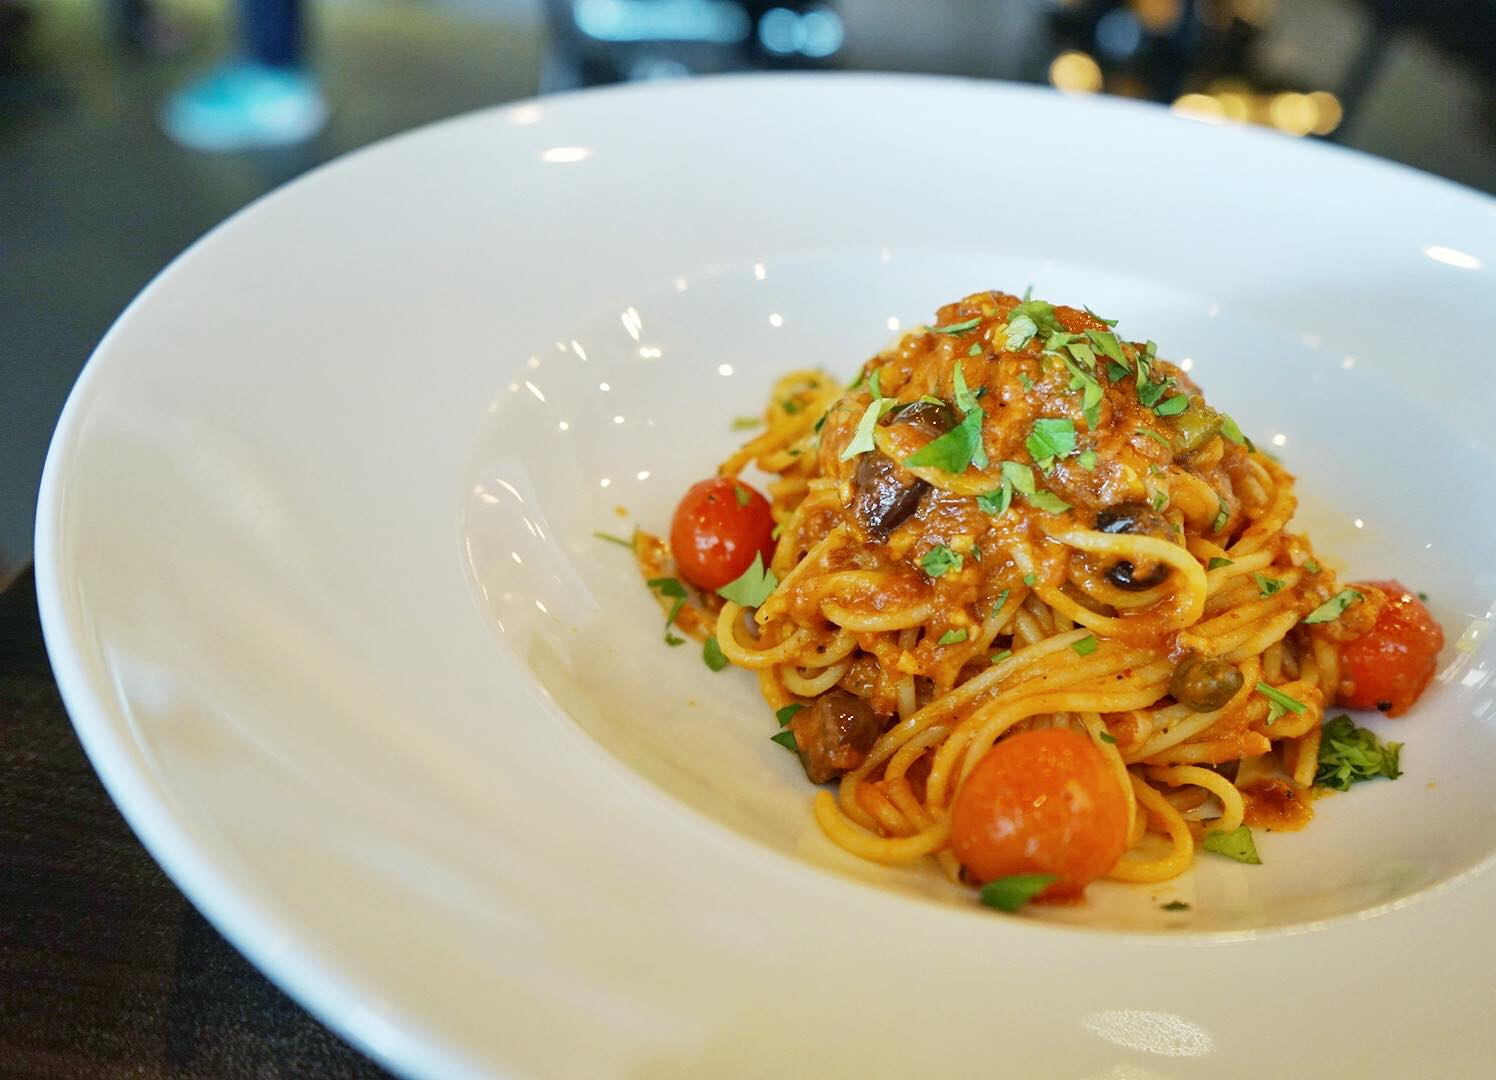 Puttanesca Pasta PocoLoco Singapore - AspirantSG